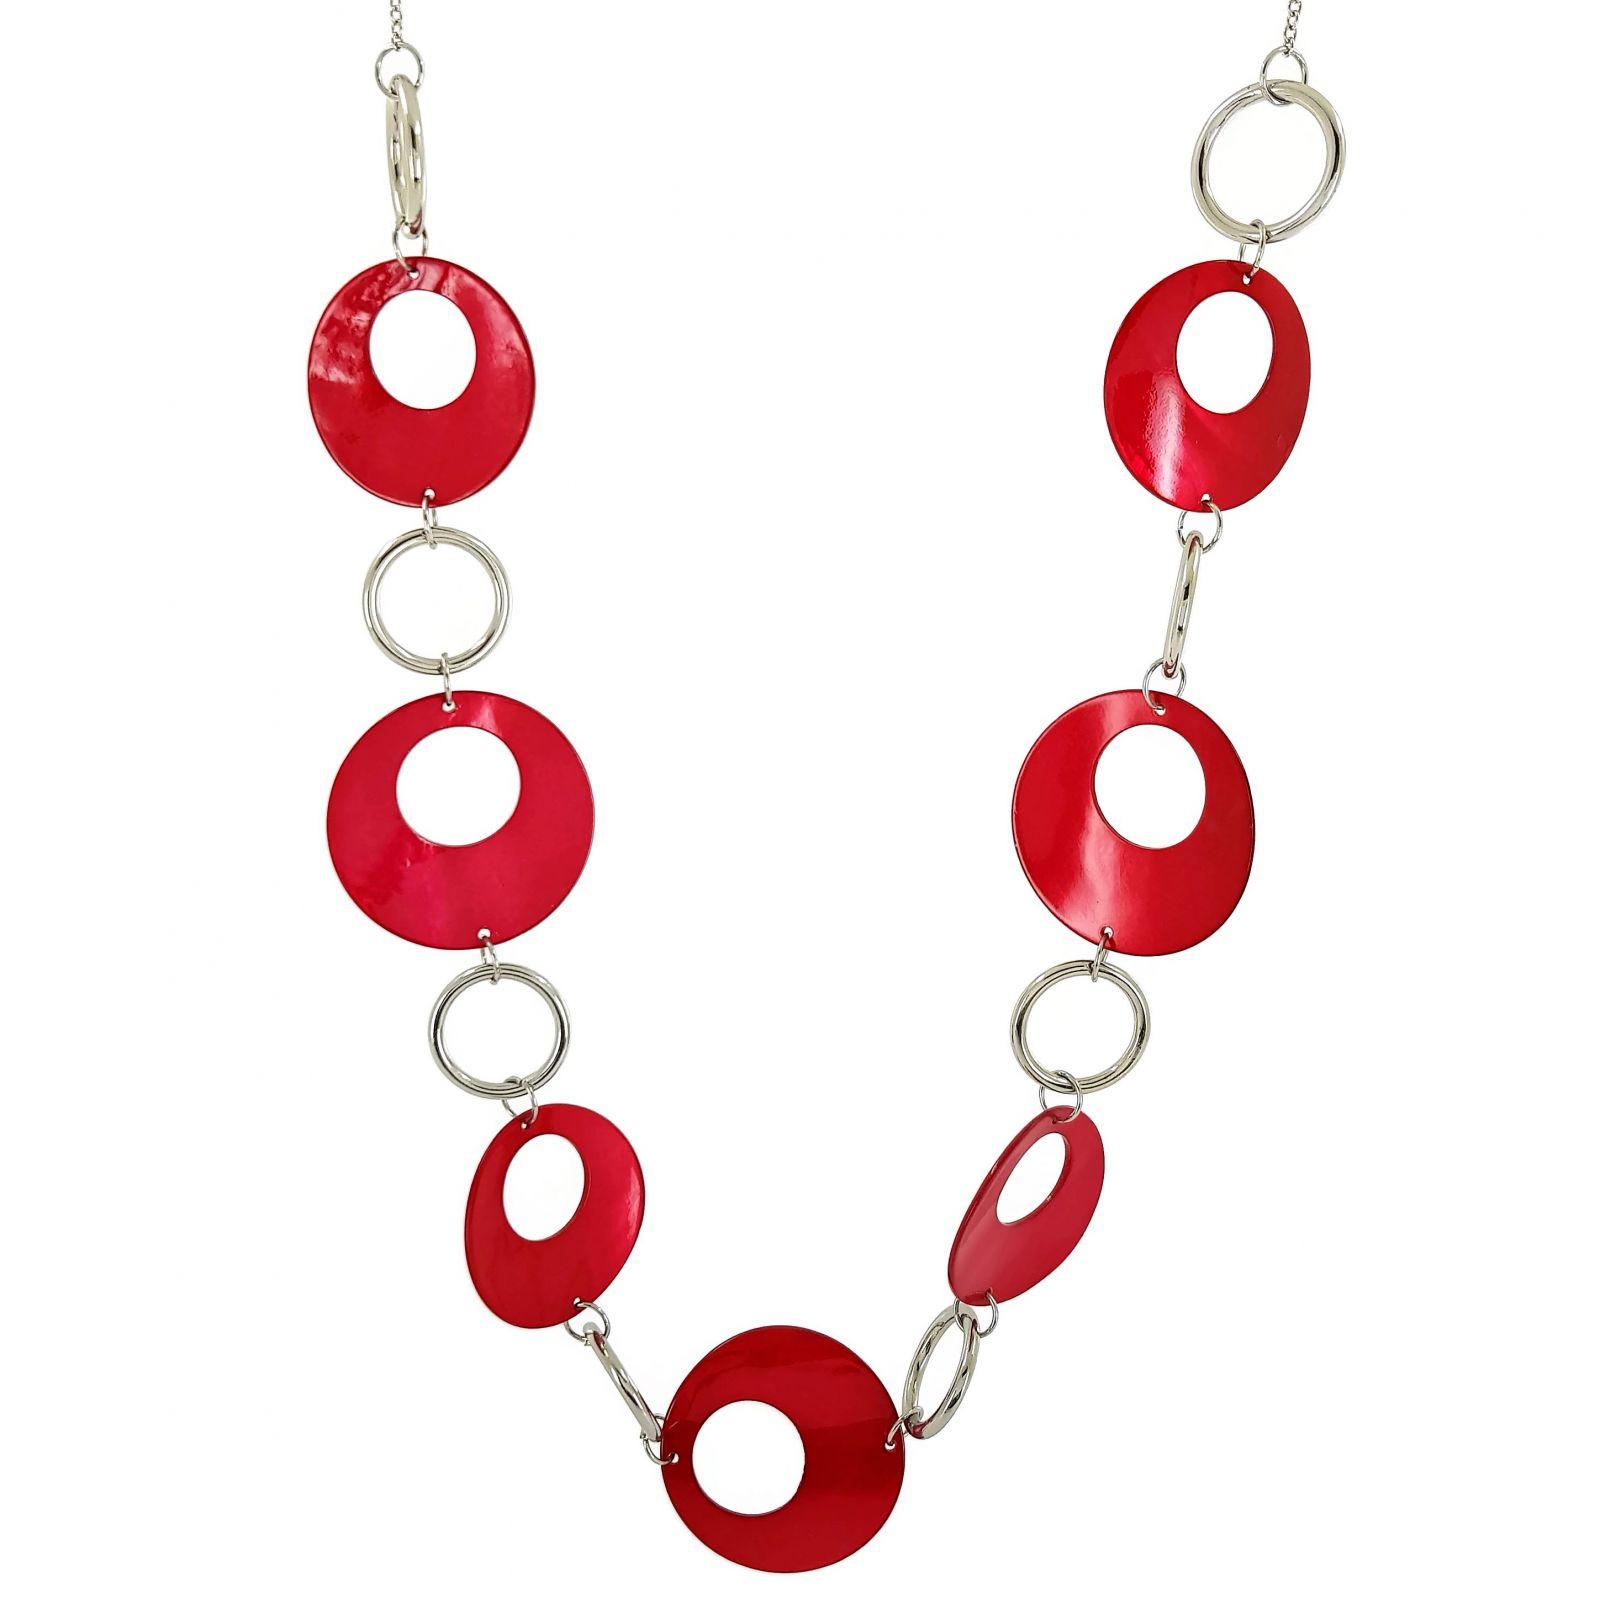 Retro náhrdelník s červenými plackami a stříbrnými kroužky GIIL